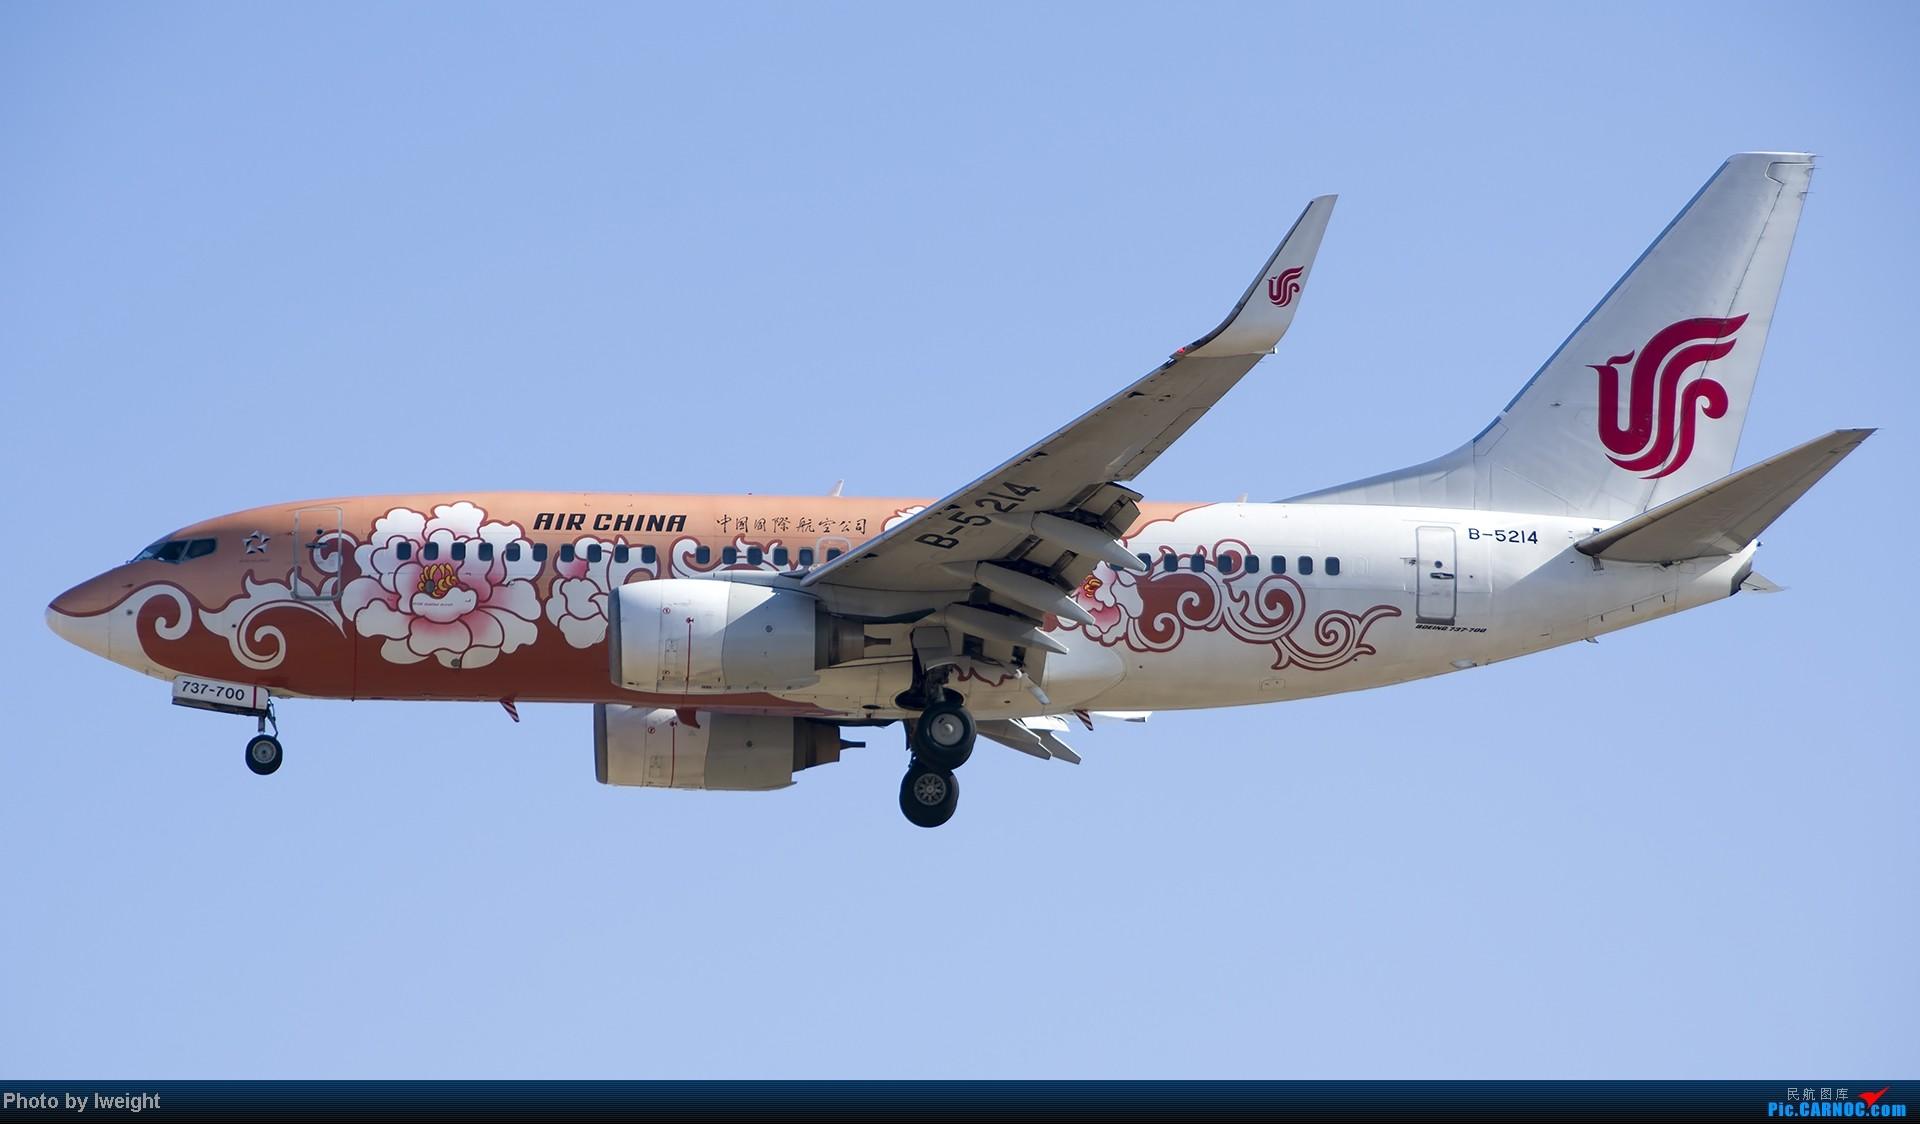 Re:[原创]抓住APEC蓝的尾巴,再拍上一组 BOEING 737-700 B-5214 中国北京首都机场